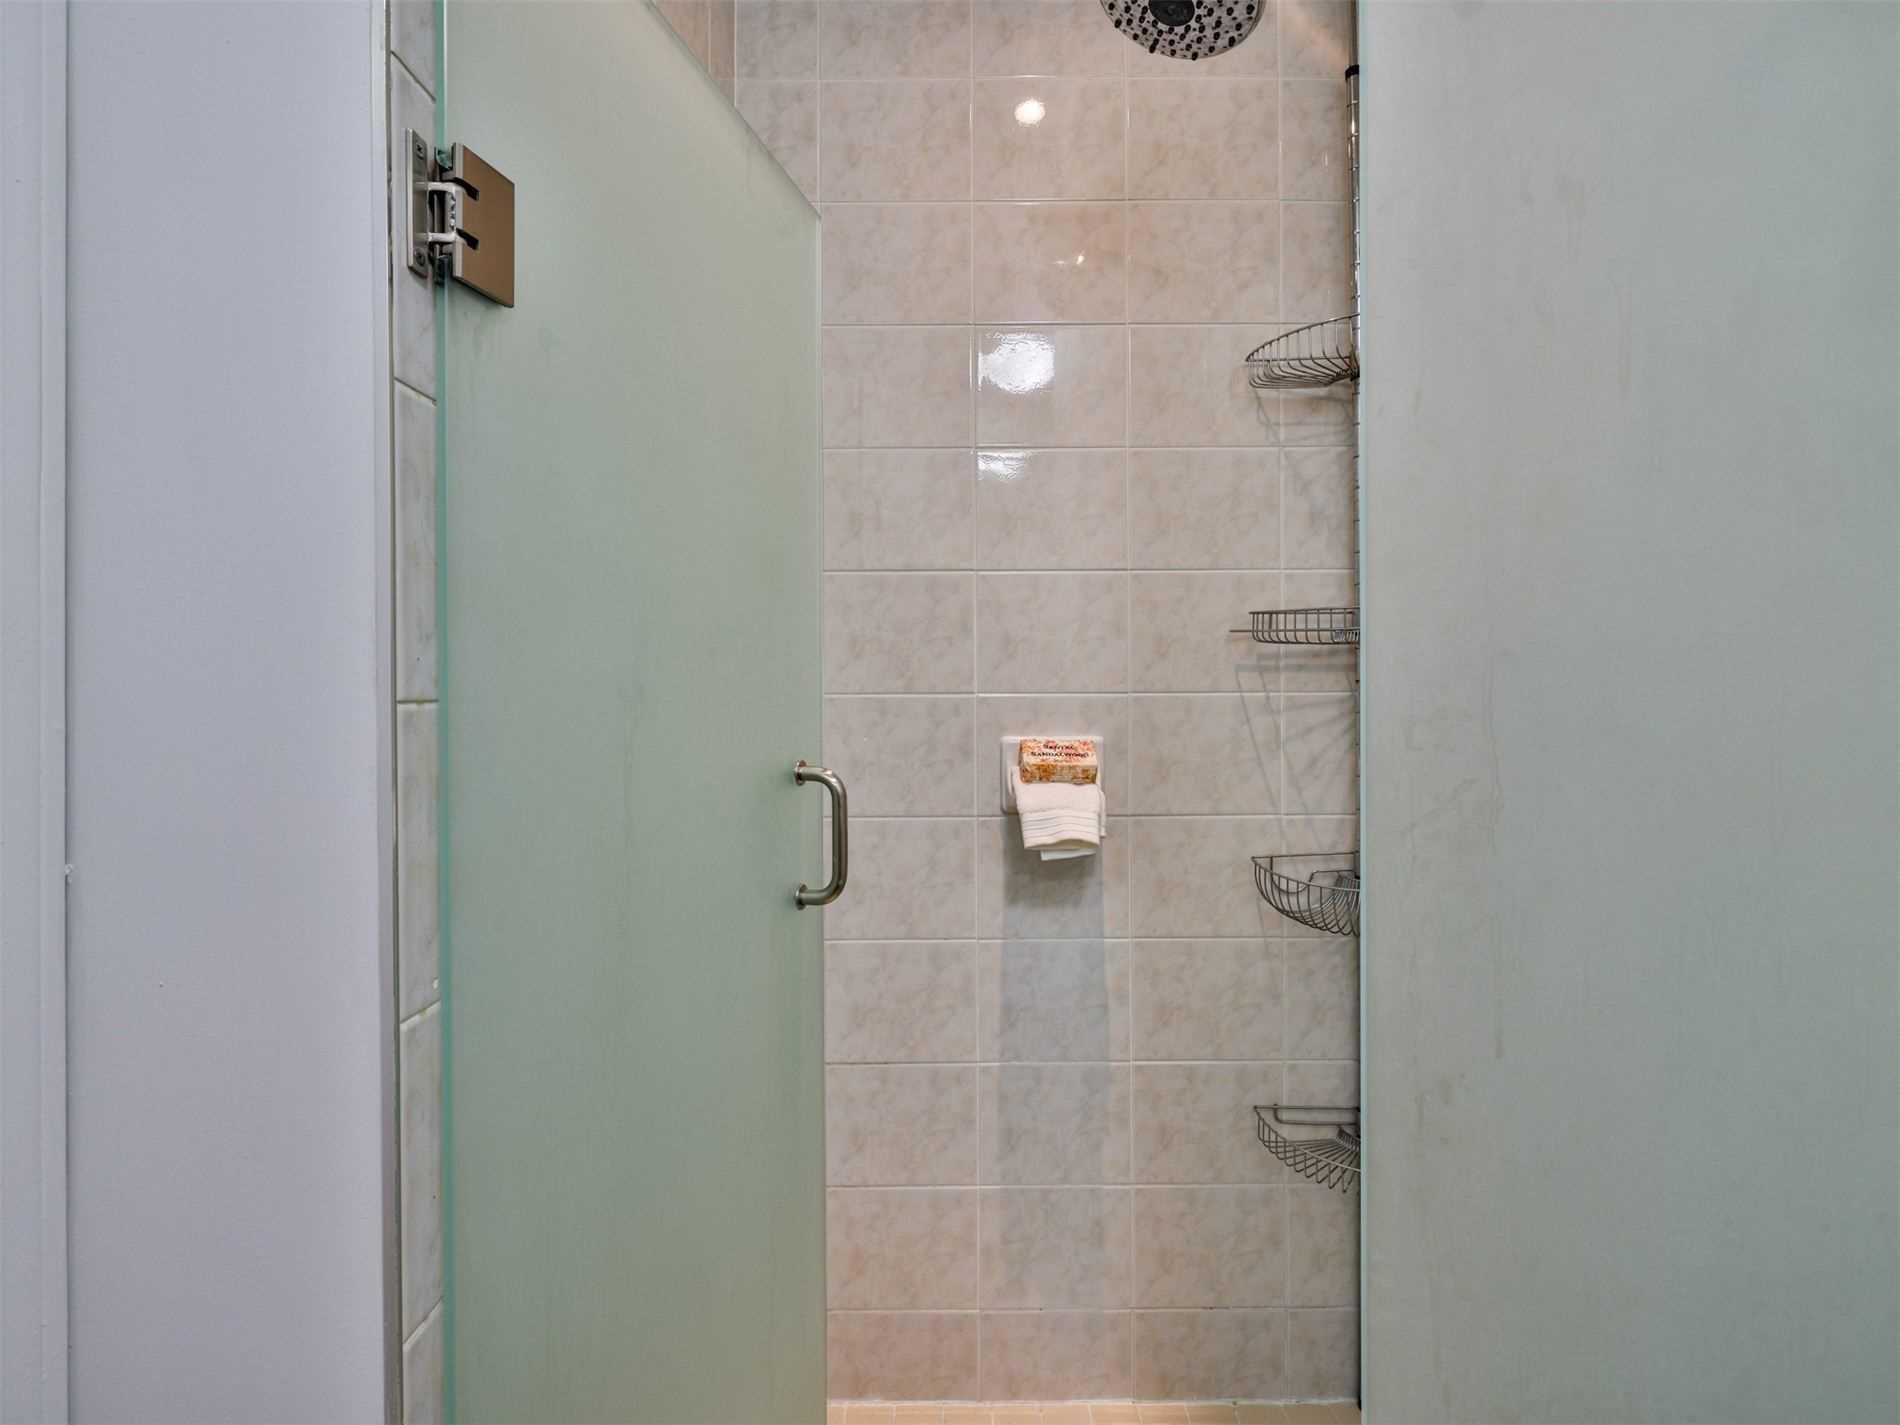 Condo Apt For Sale In Toronto , 2 Bedrooms Bedrooms, ,2 BathroomsBathrooms,Condo Apt,For Sale,2003,King